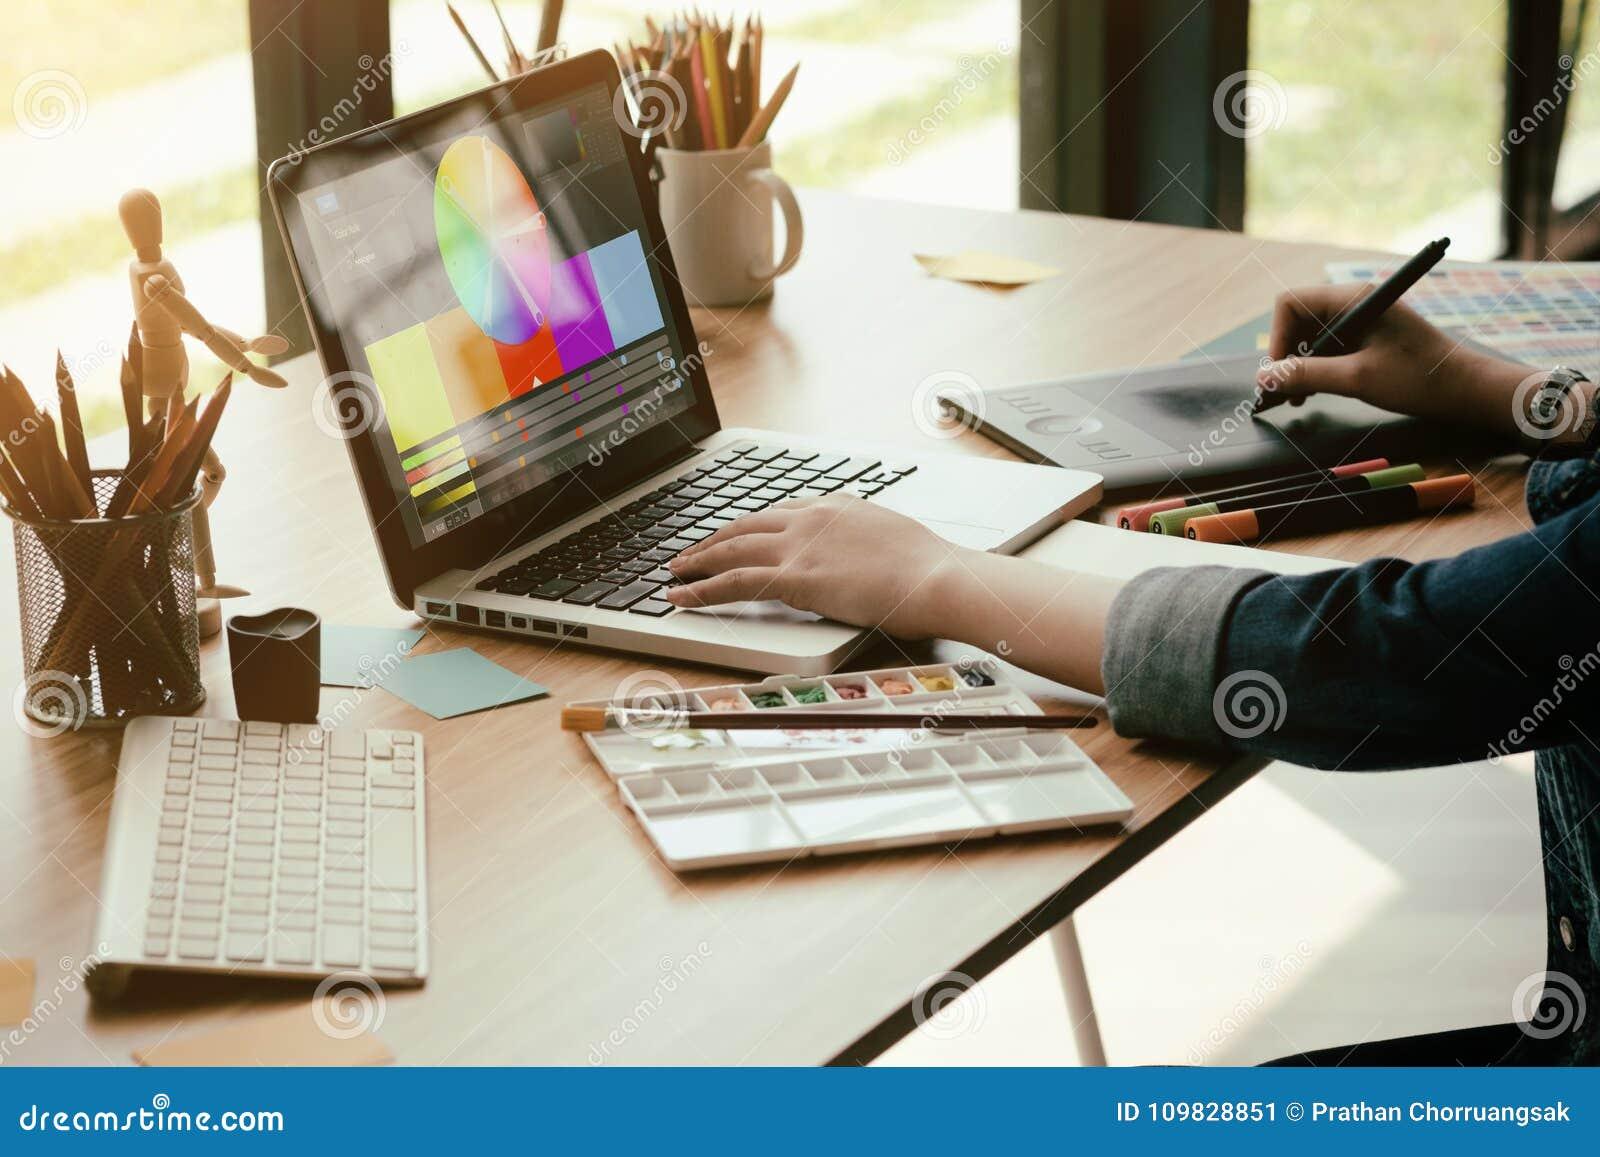 Graphic design working with computer creative,designer job work.